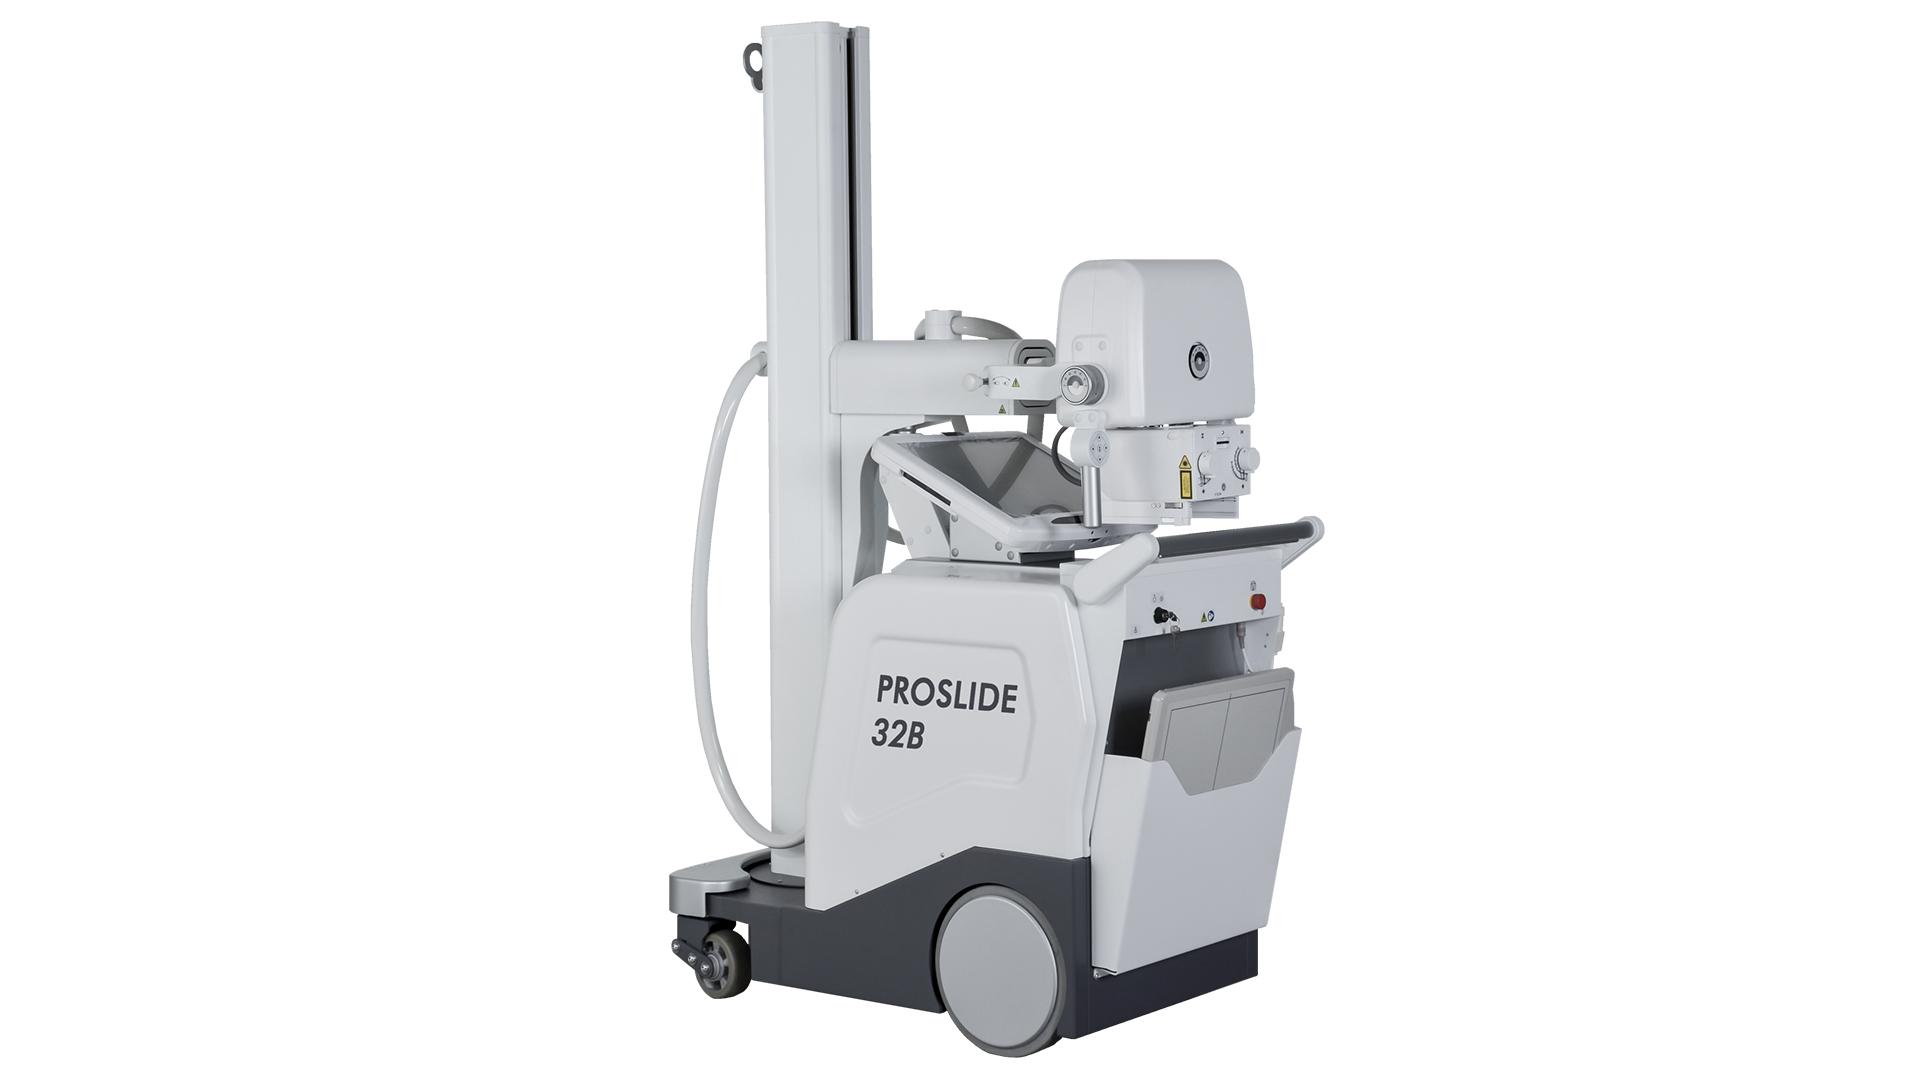 Röntgentechnik mobil: protec PROSLIDE 32 B